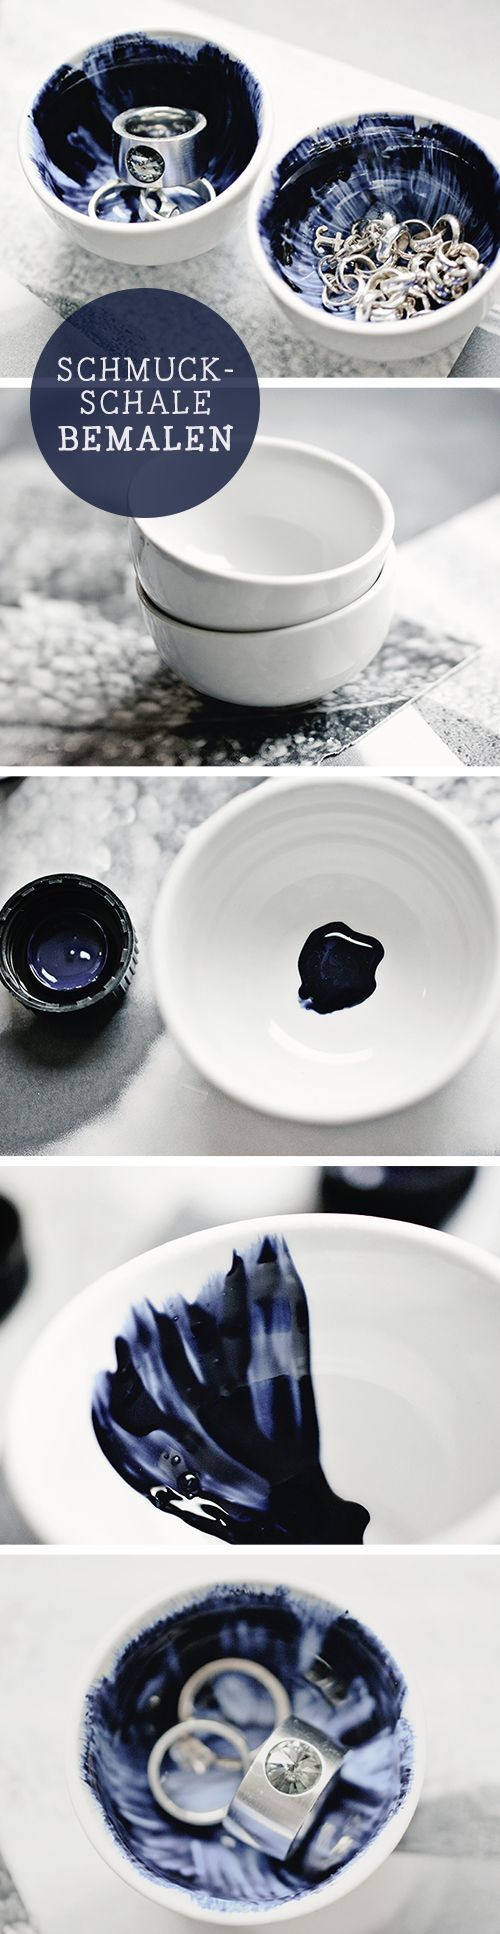 DIY-Tutorial für eine selbstgefärbte Schmuckschale im Shibori Stil / shibori styled jewellery bowl, diy tutorial via http://DaWanda.com